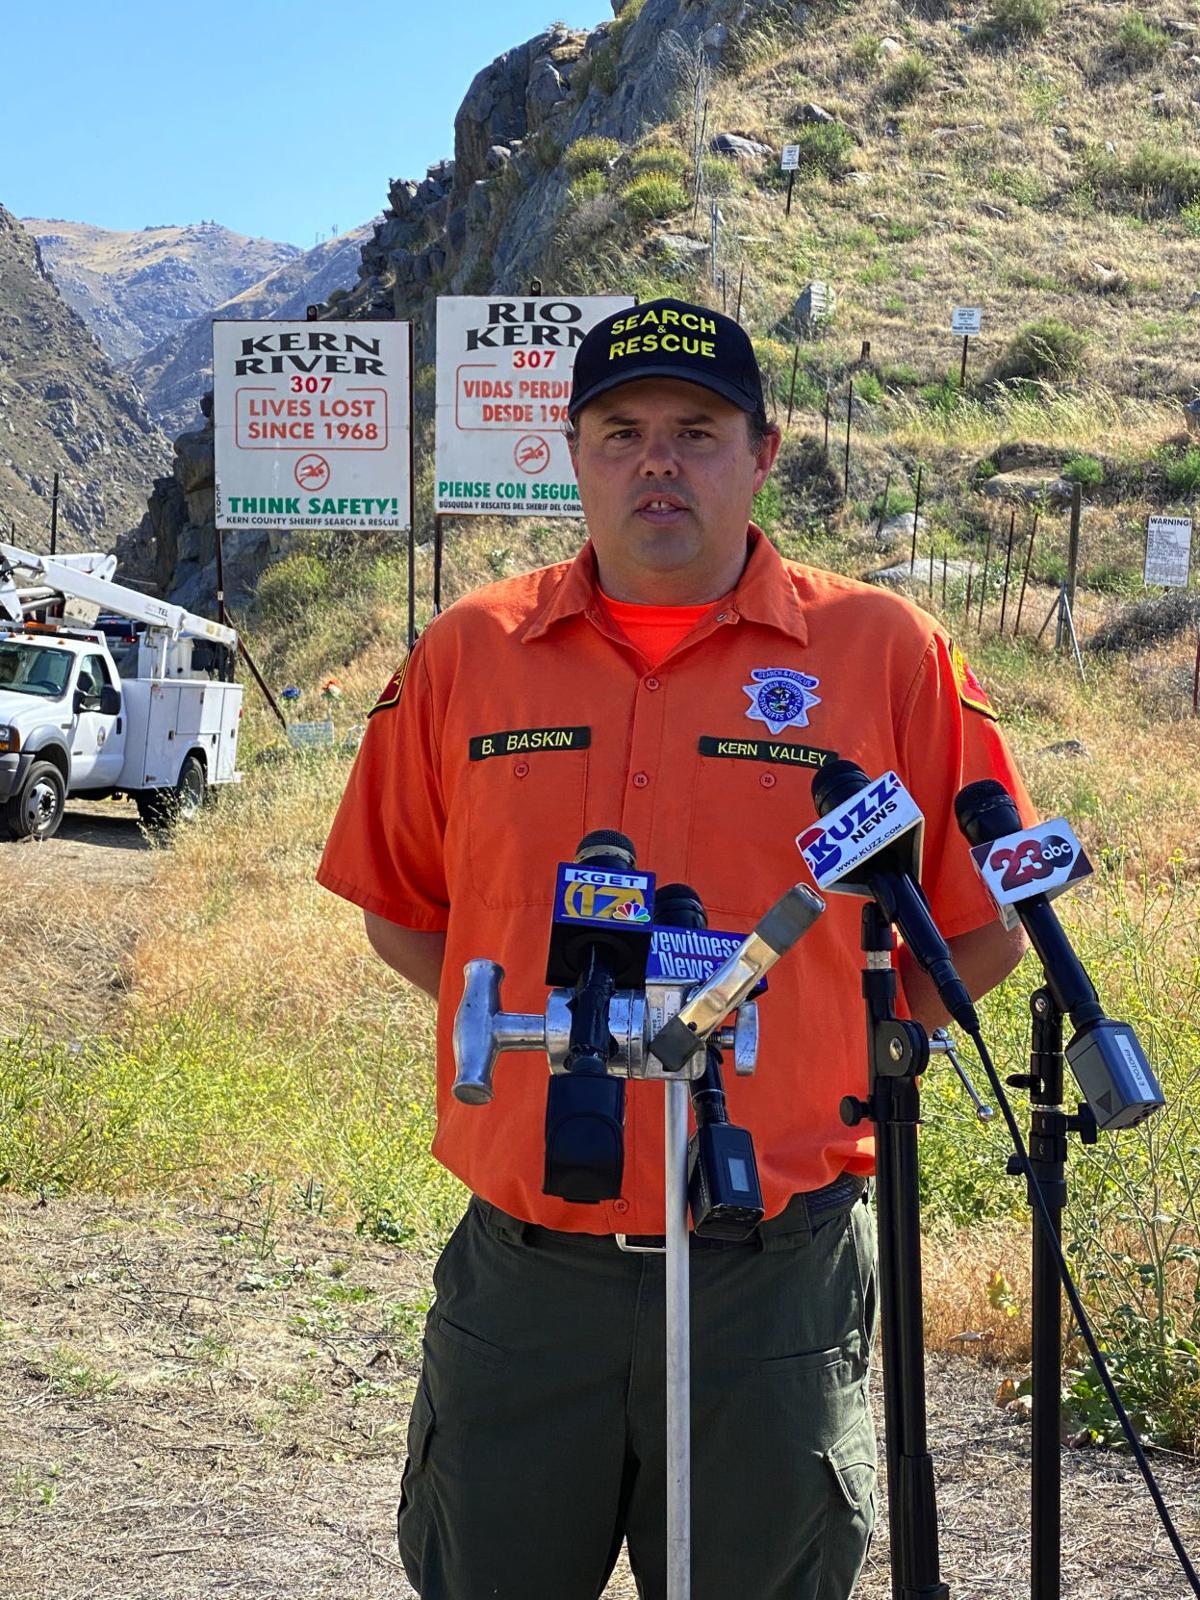 kr deaths Brian Baskin Capt SaR Kern River Valley